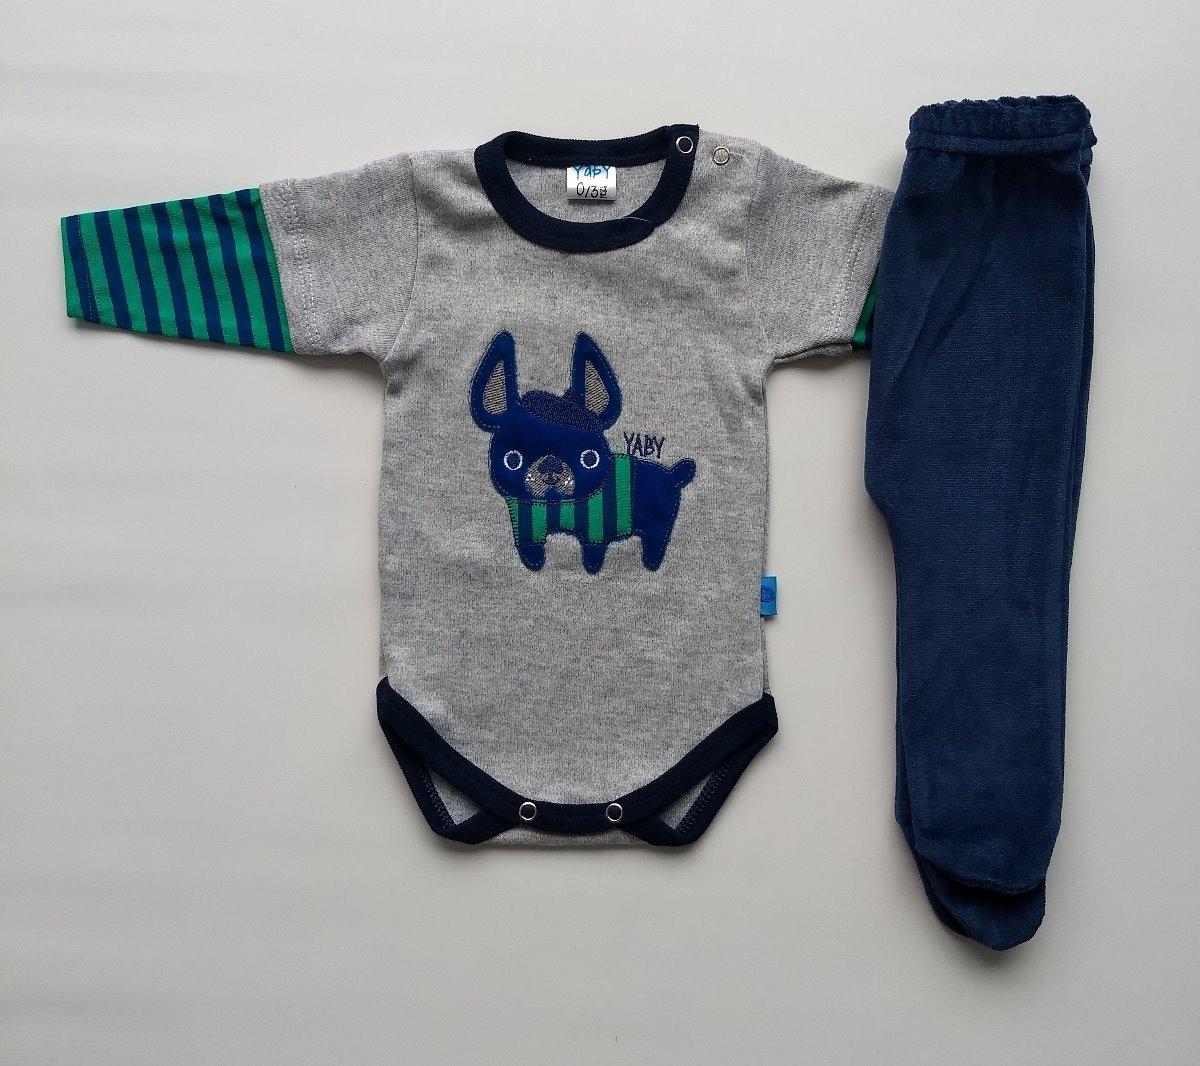 c2ef53c65 conjunto bebe body pantalon medio osito plush varon nene. Cargando zoom.